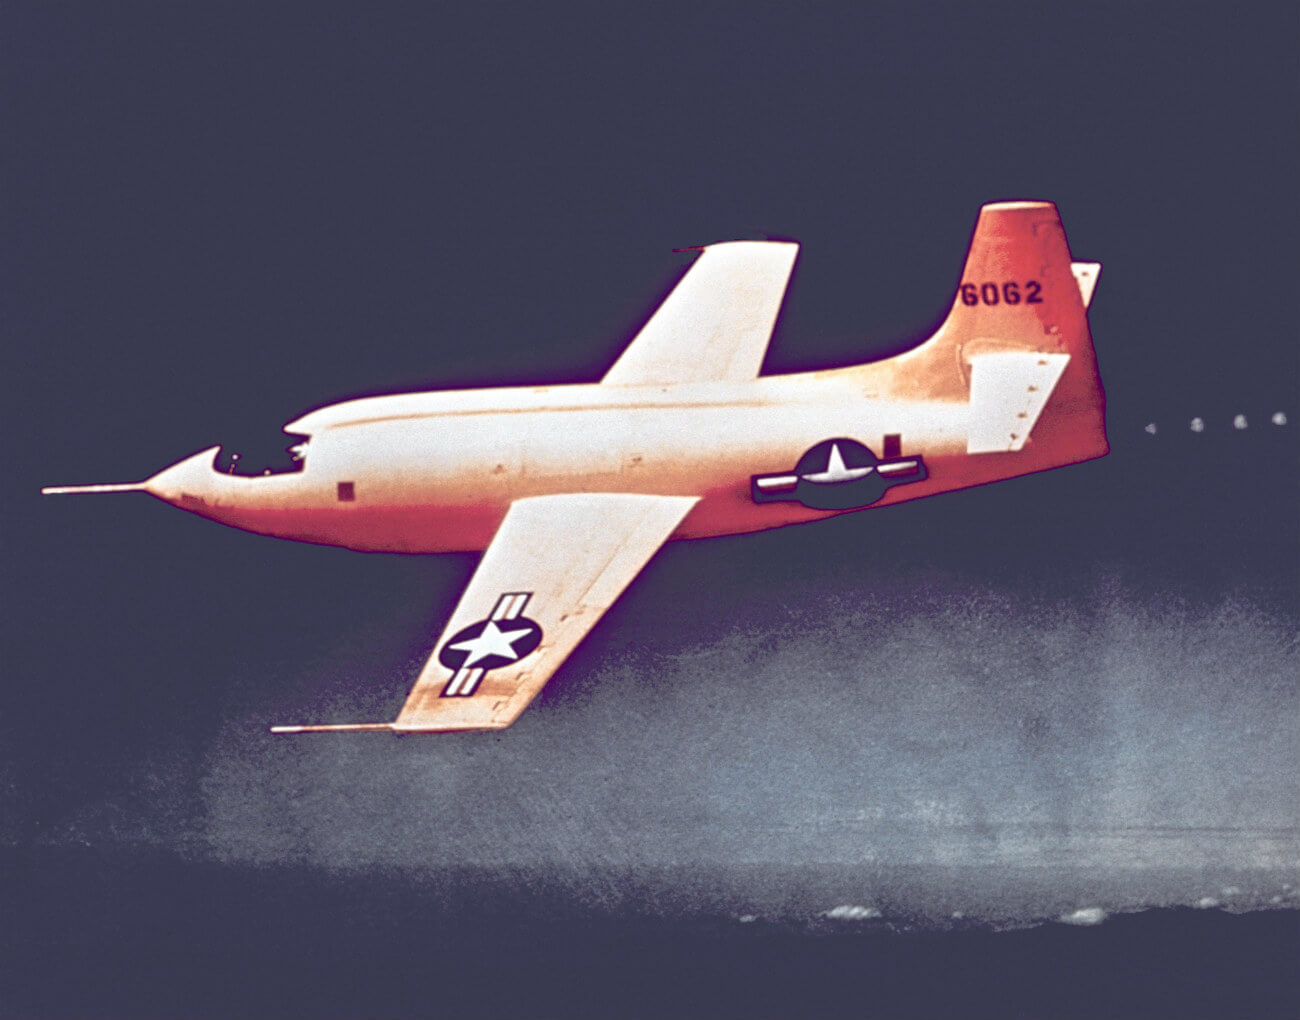 NASA Experimental Aircraft Images - Bell X-1 cruising altitude